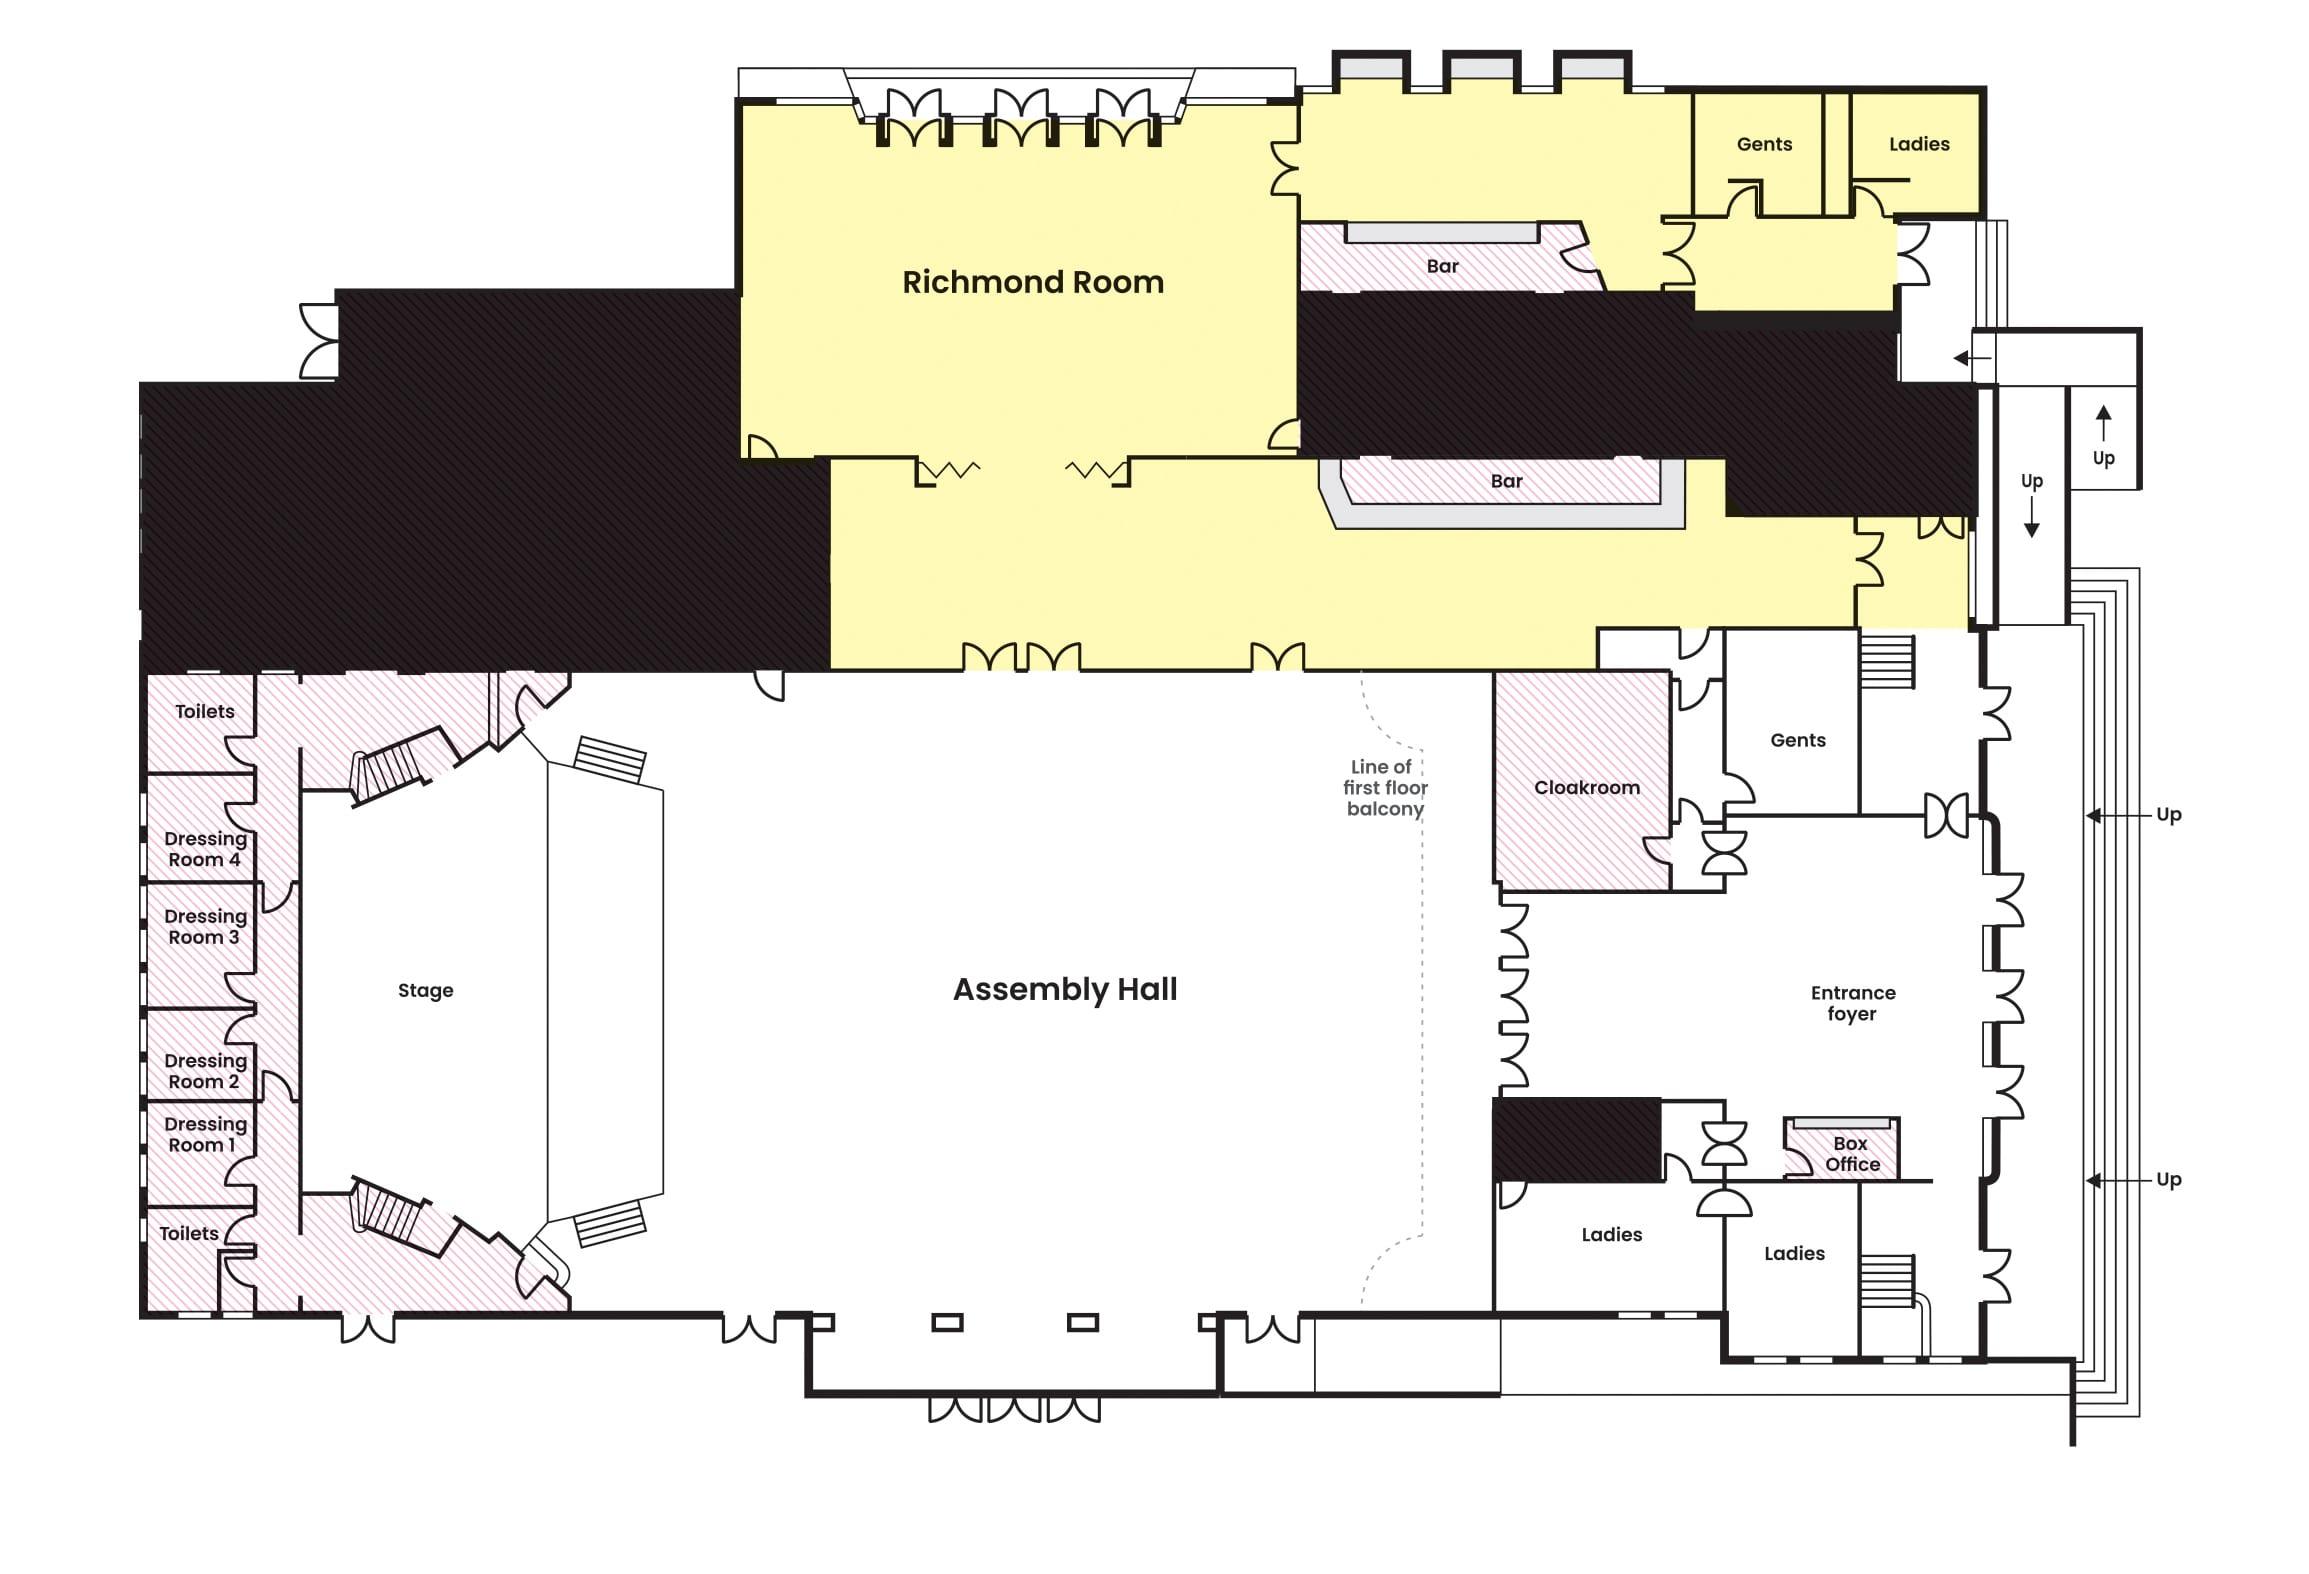 Assembly Hall - Richmond Room - Floor Plan